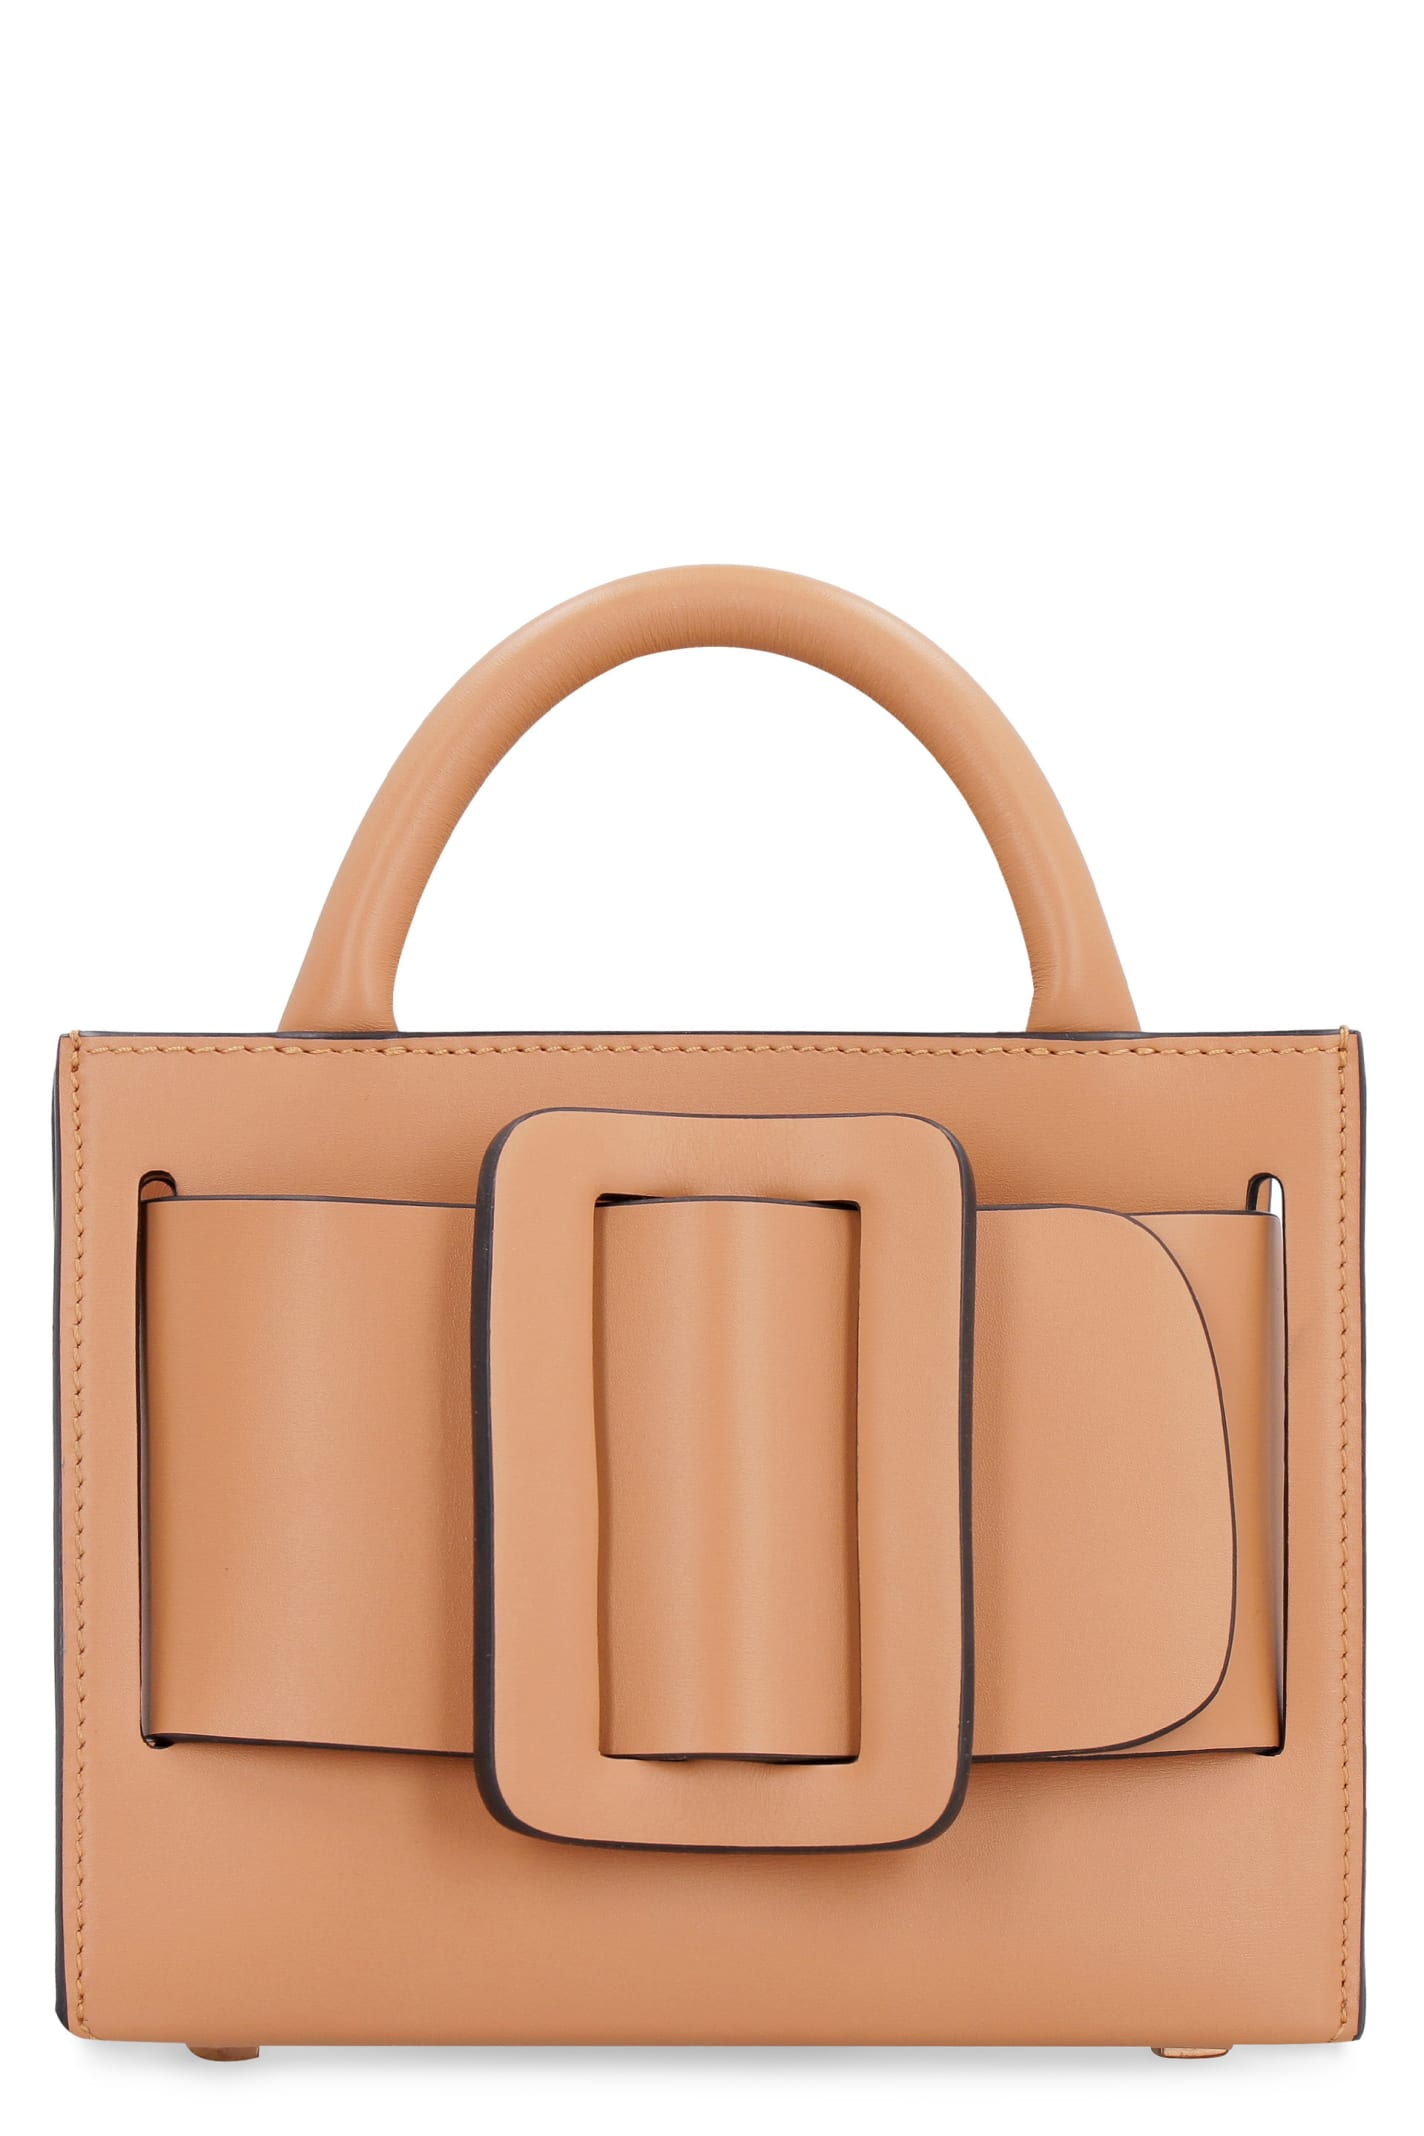 Bobby 18 Mini Handbag